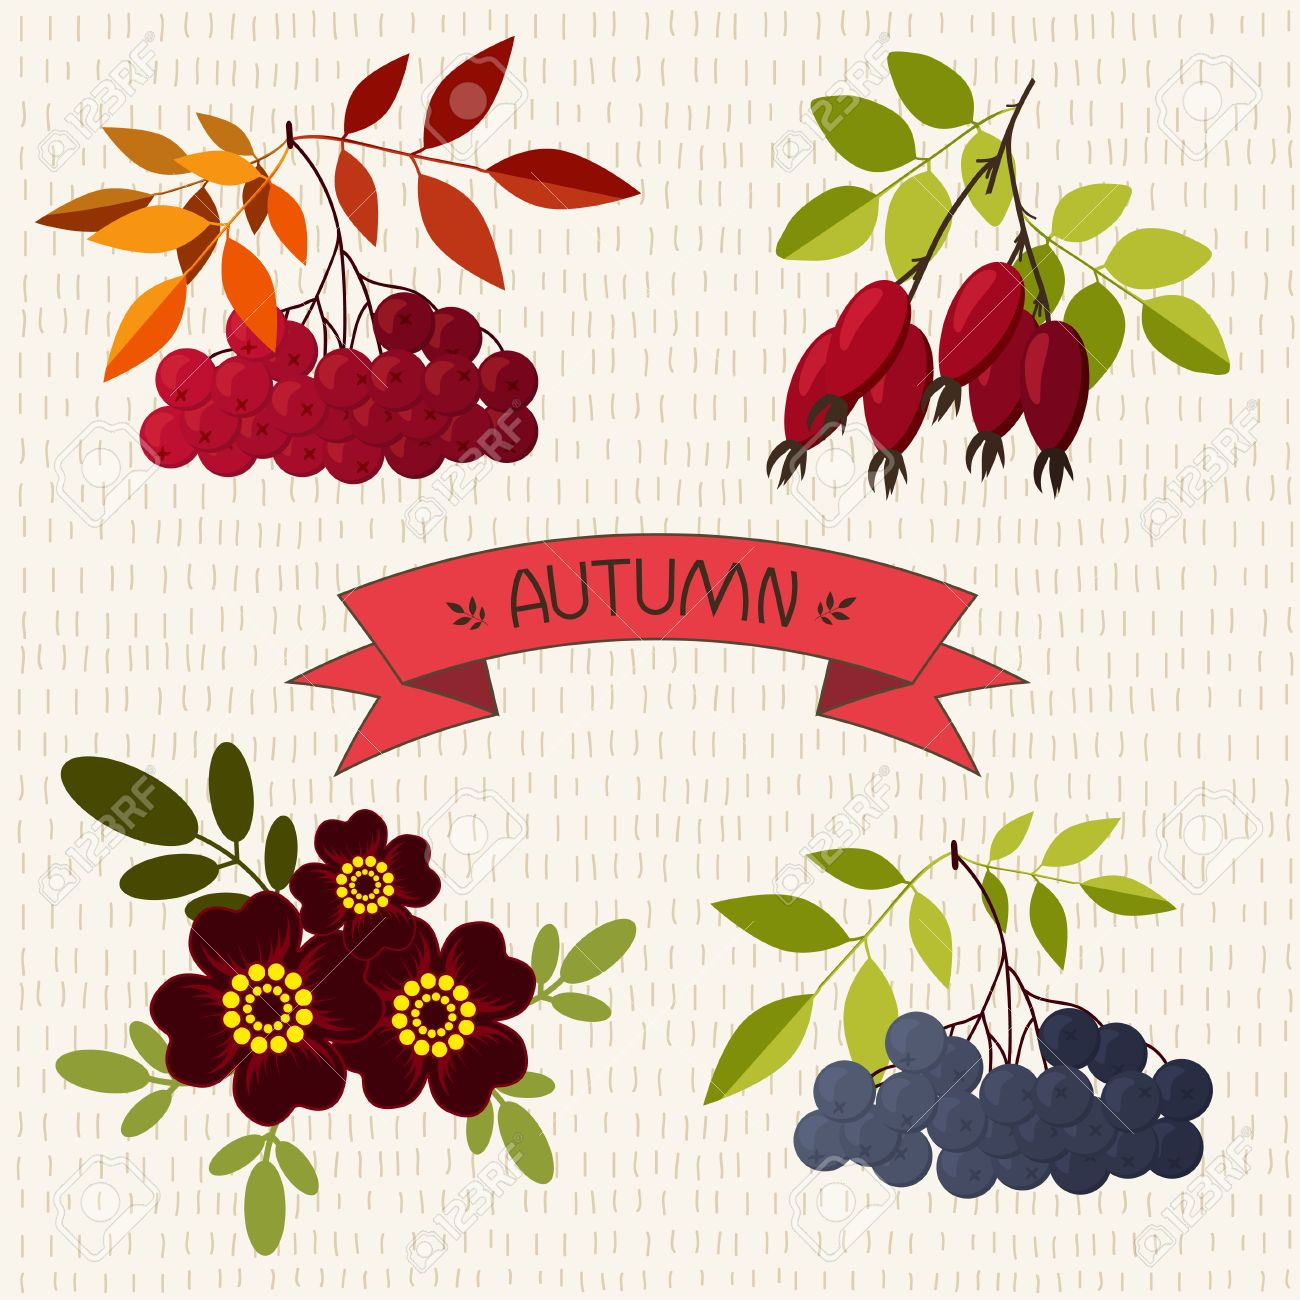 Autumn. Mountain Ash, Chokeberry, Rose, Marigold On The Hand.